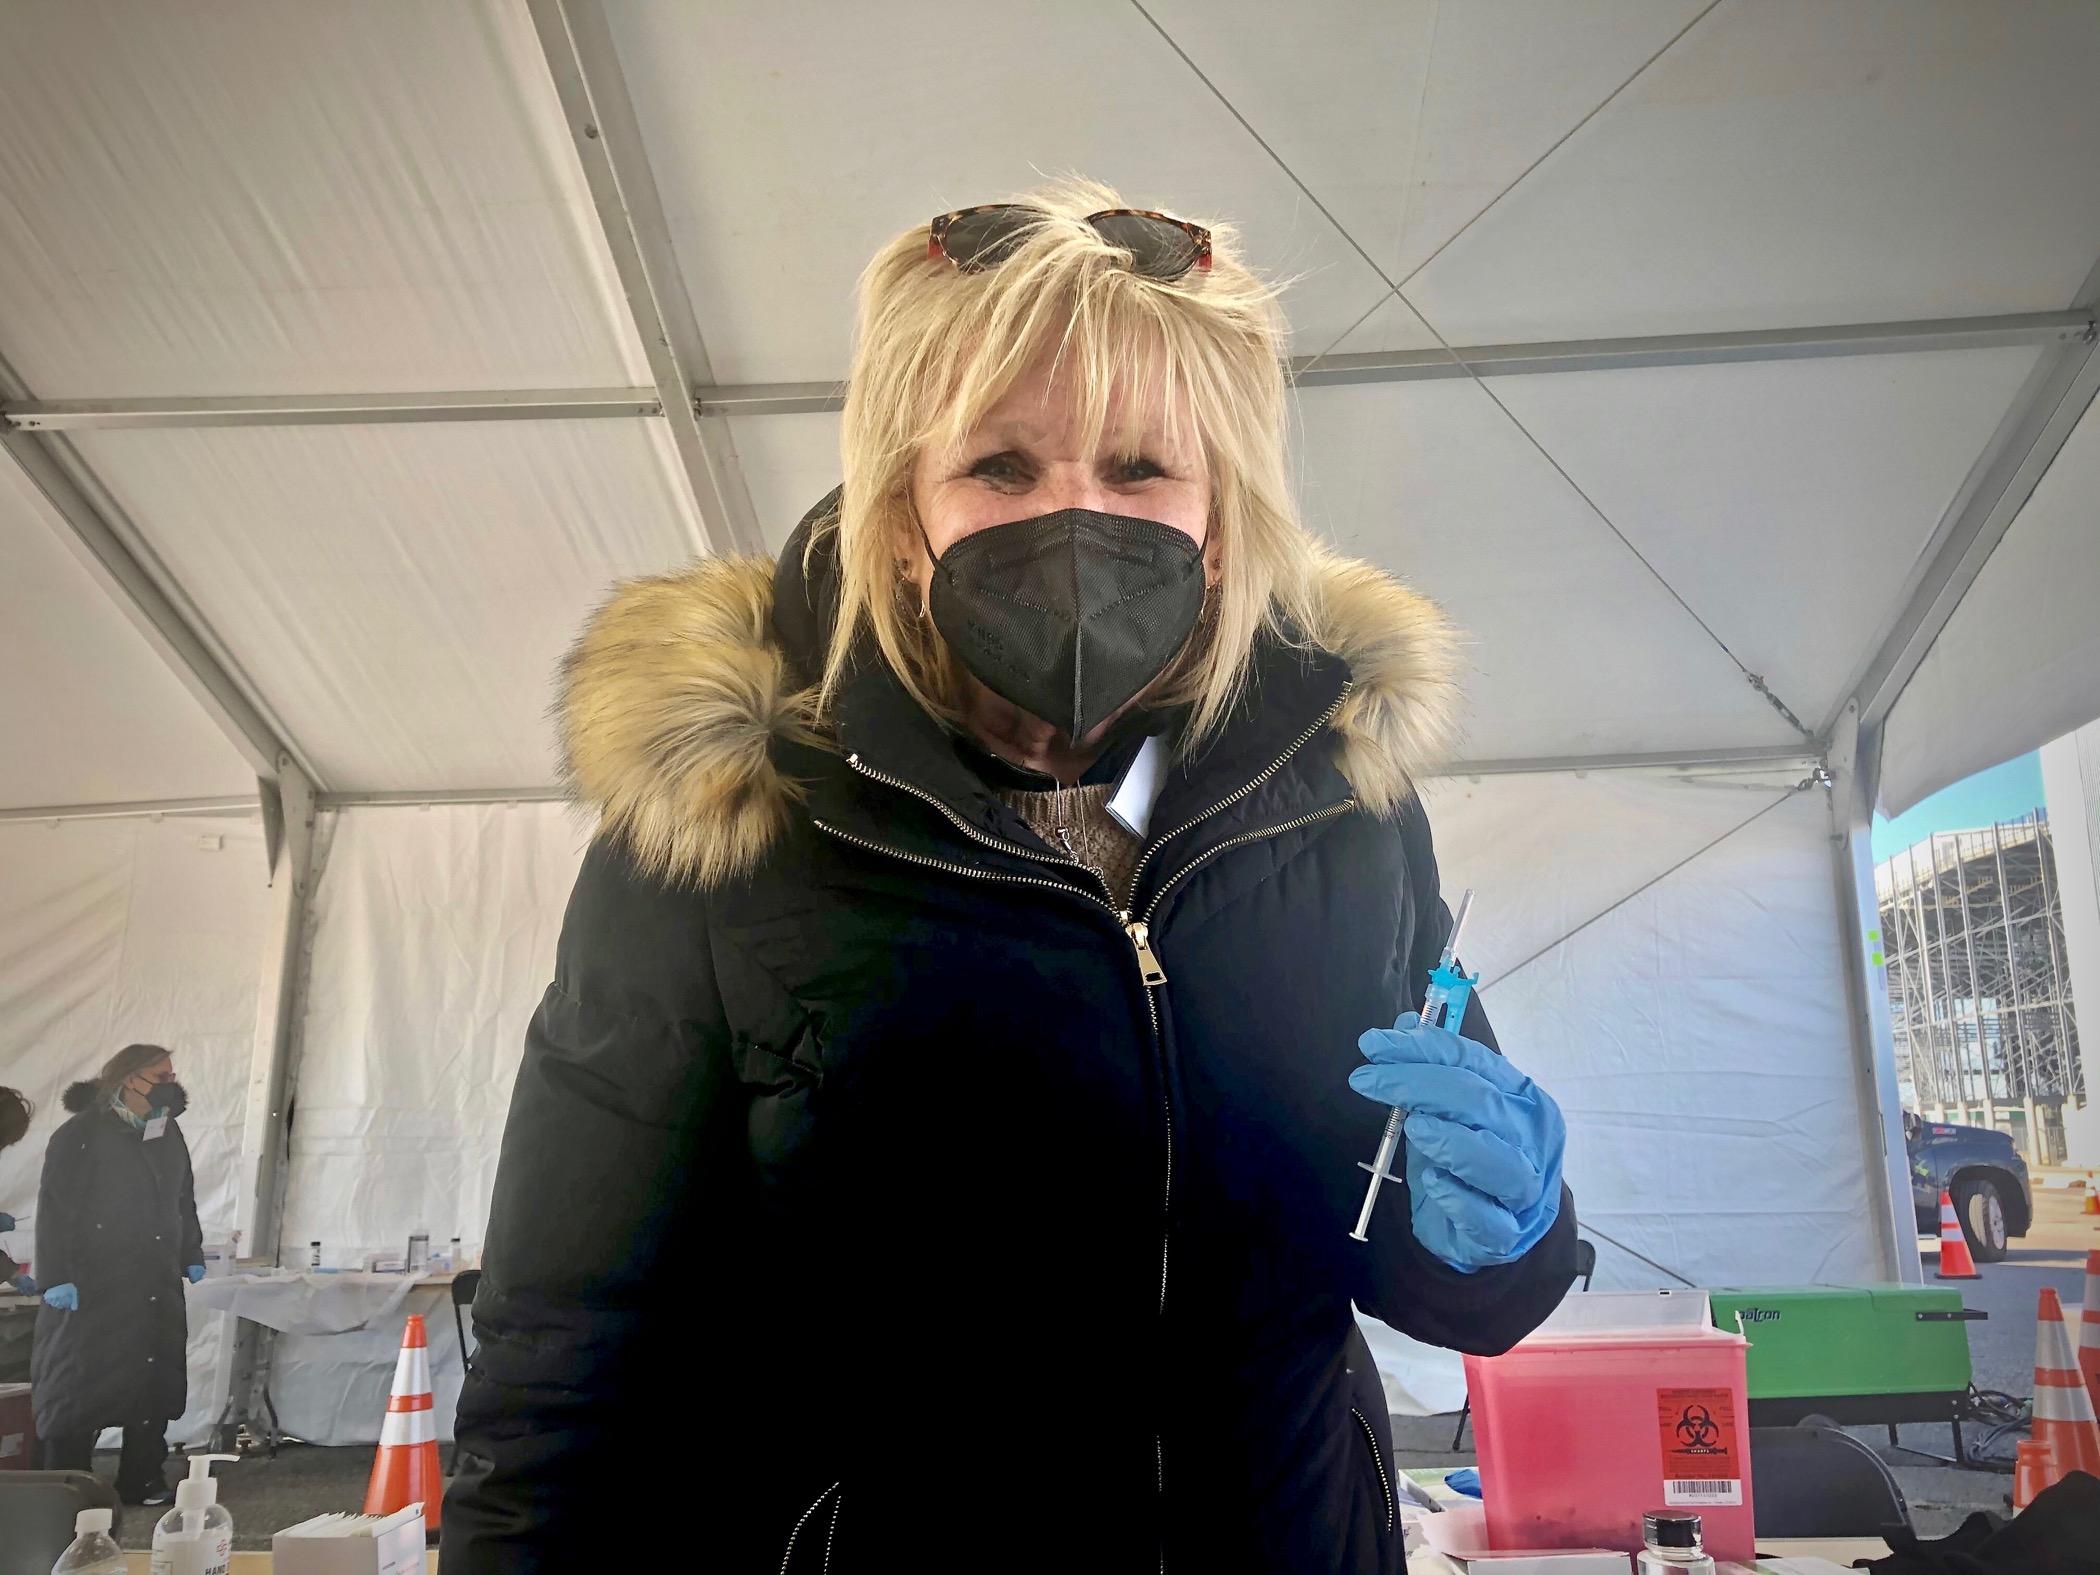 Nurse Debbie Petro wearing a face mask and winter coat